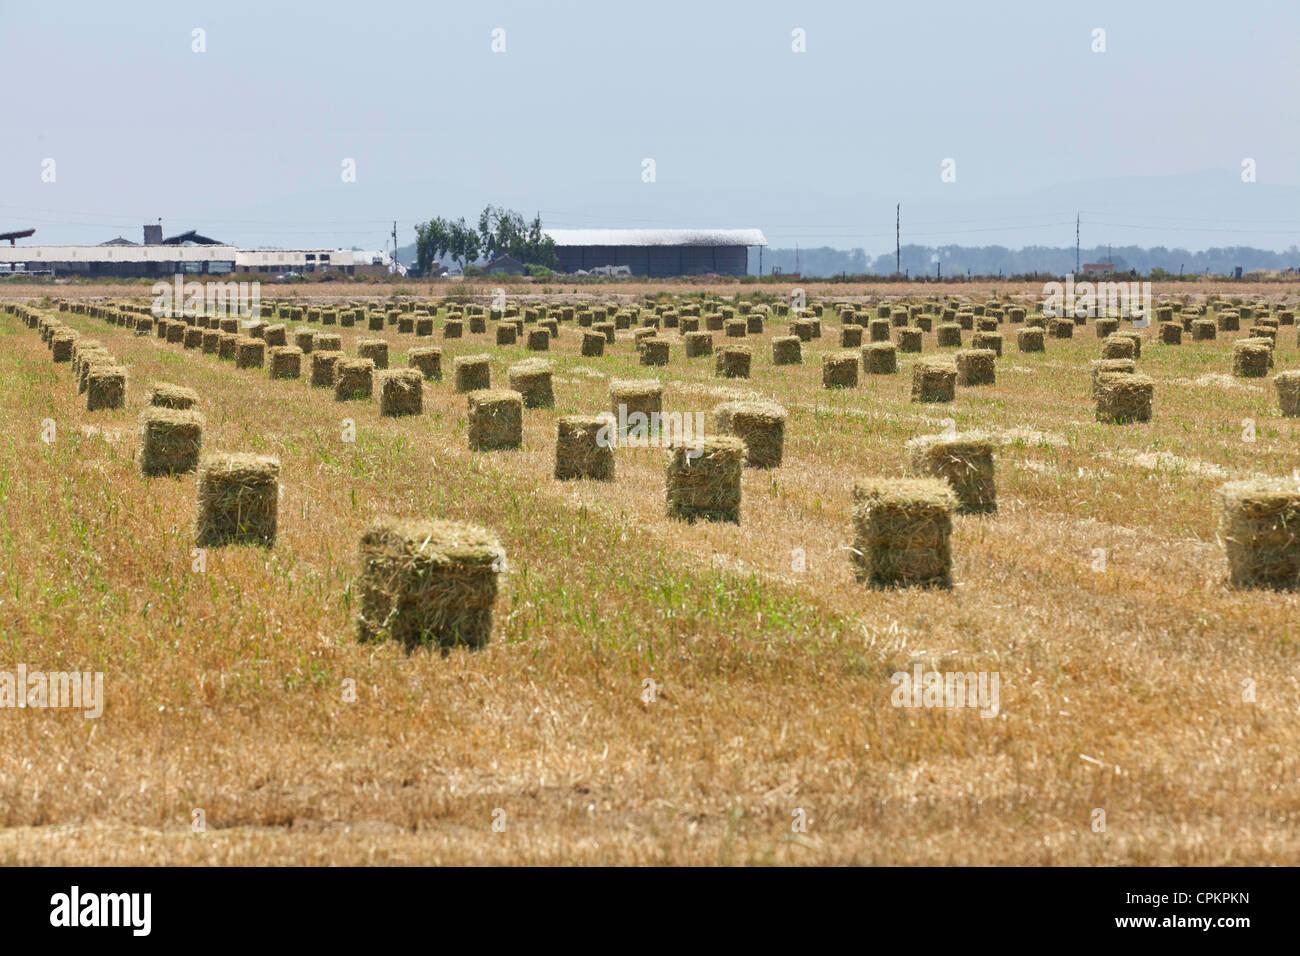 Bottes de foin sur les terres agricoles - California USA Photo Stock